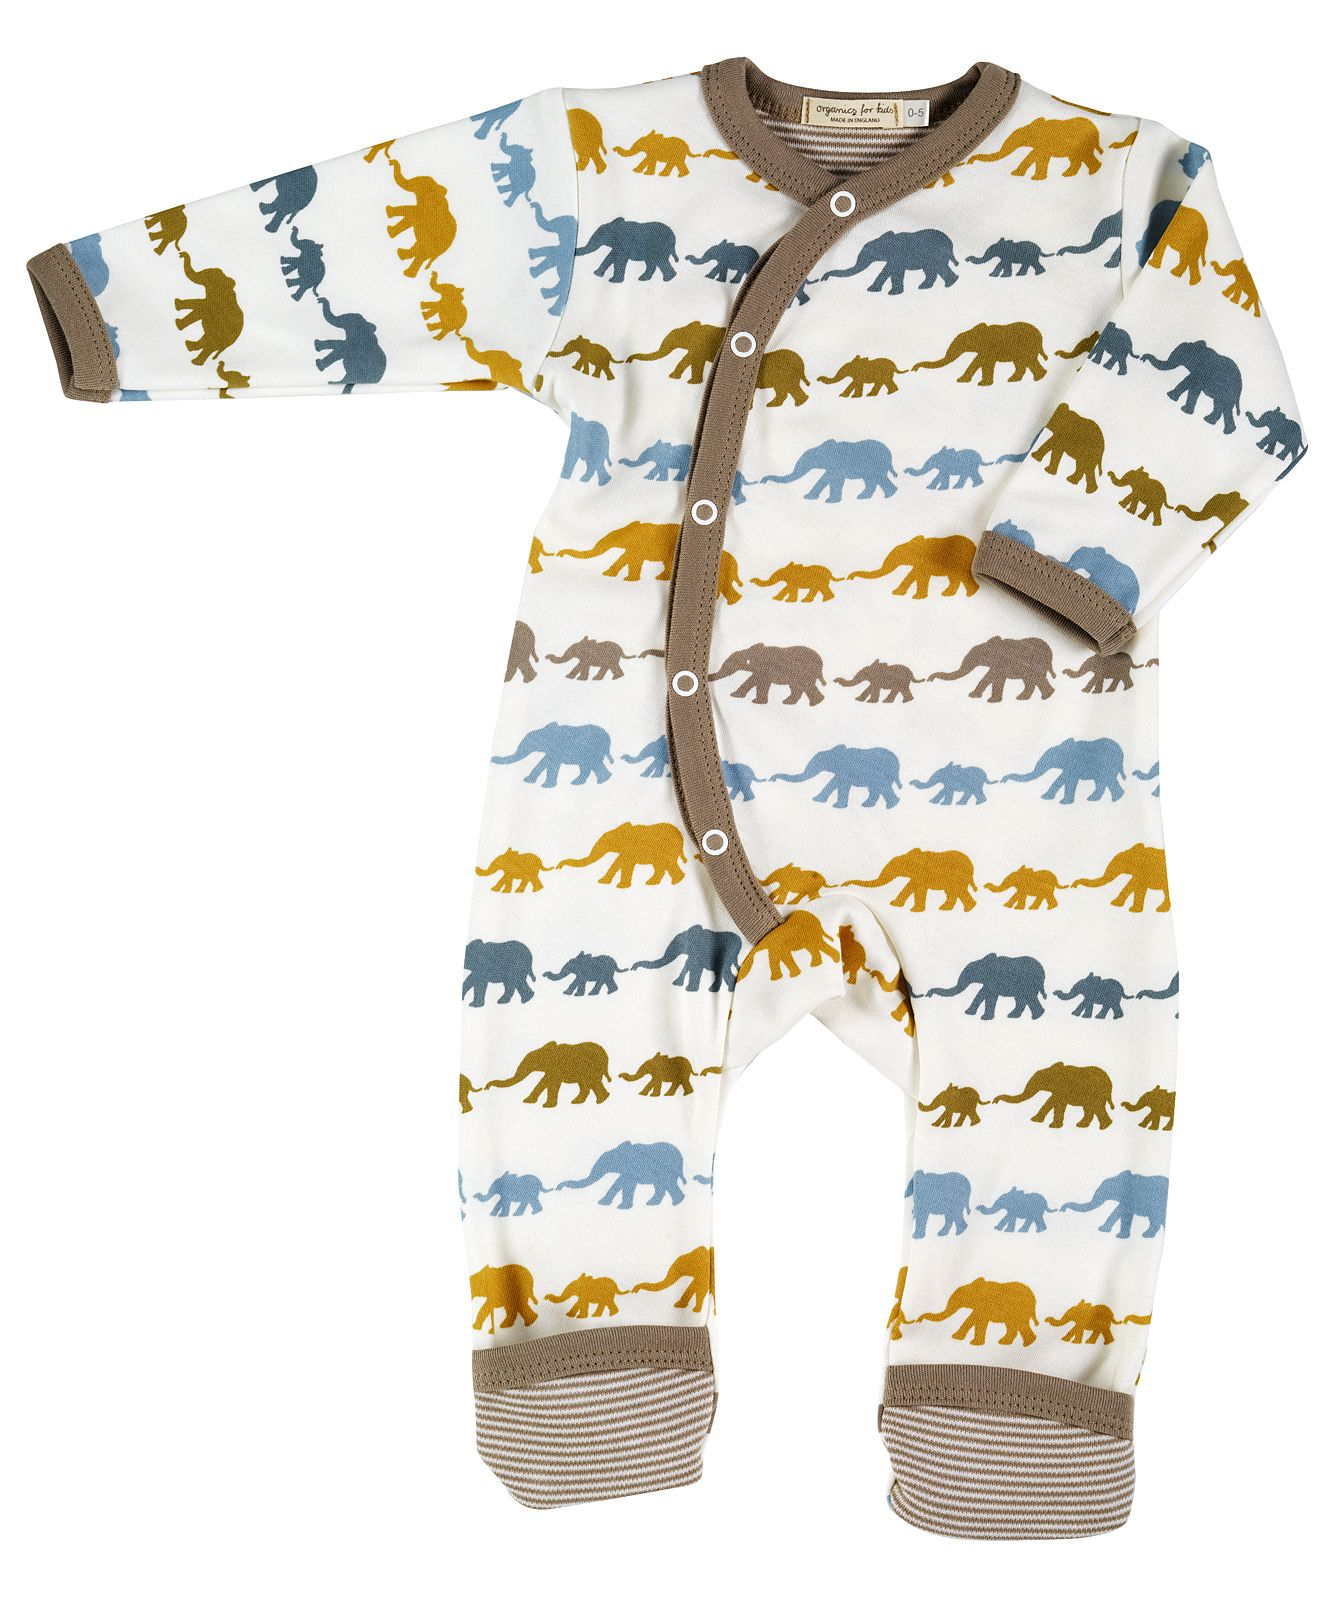 Organic Cotton Long Elephant Romper Suit Organics for Kids Newborn